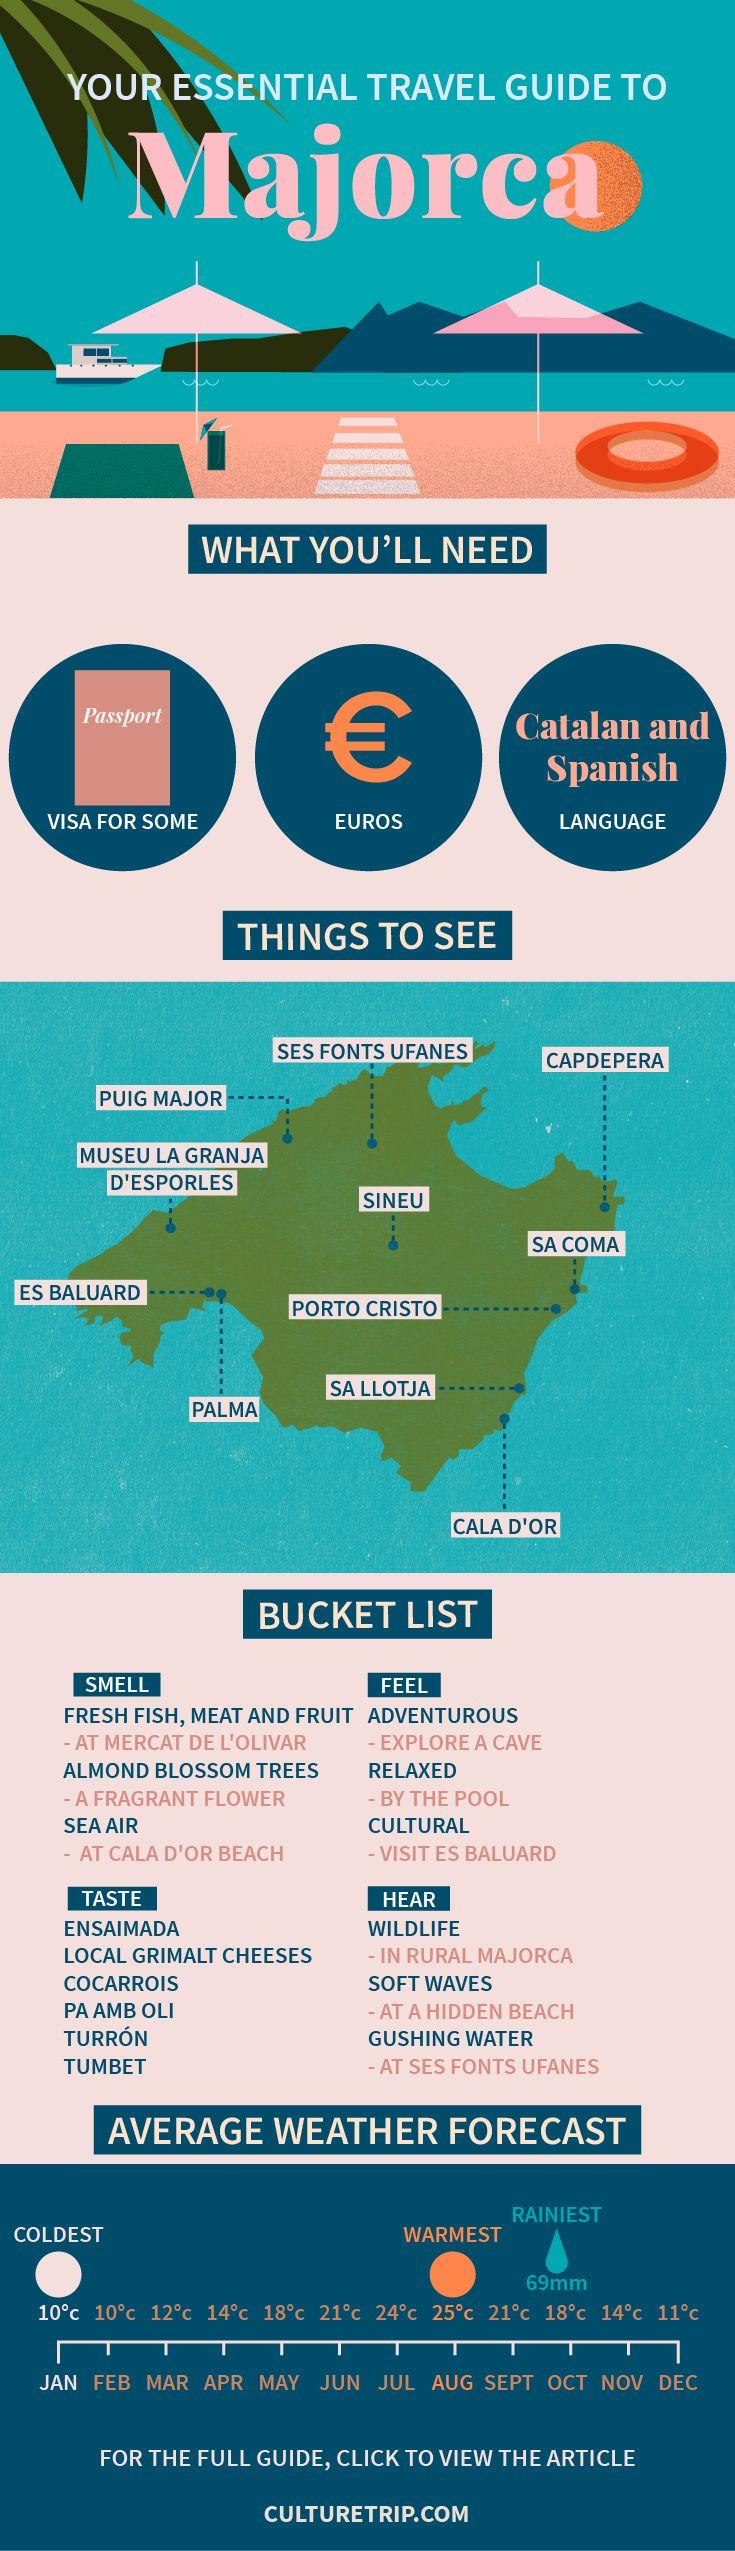 Your Essential Travel Guide to Majorca (Infographic) | Majorca, Island, weekend break, Europe, bucket list, wanderlust, adventure, challenge, coffee, bar, food, must try, Summer, Beach, Spain, Palma, Maadrid